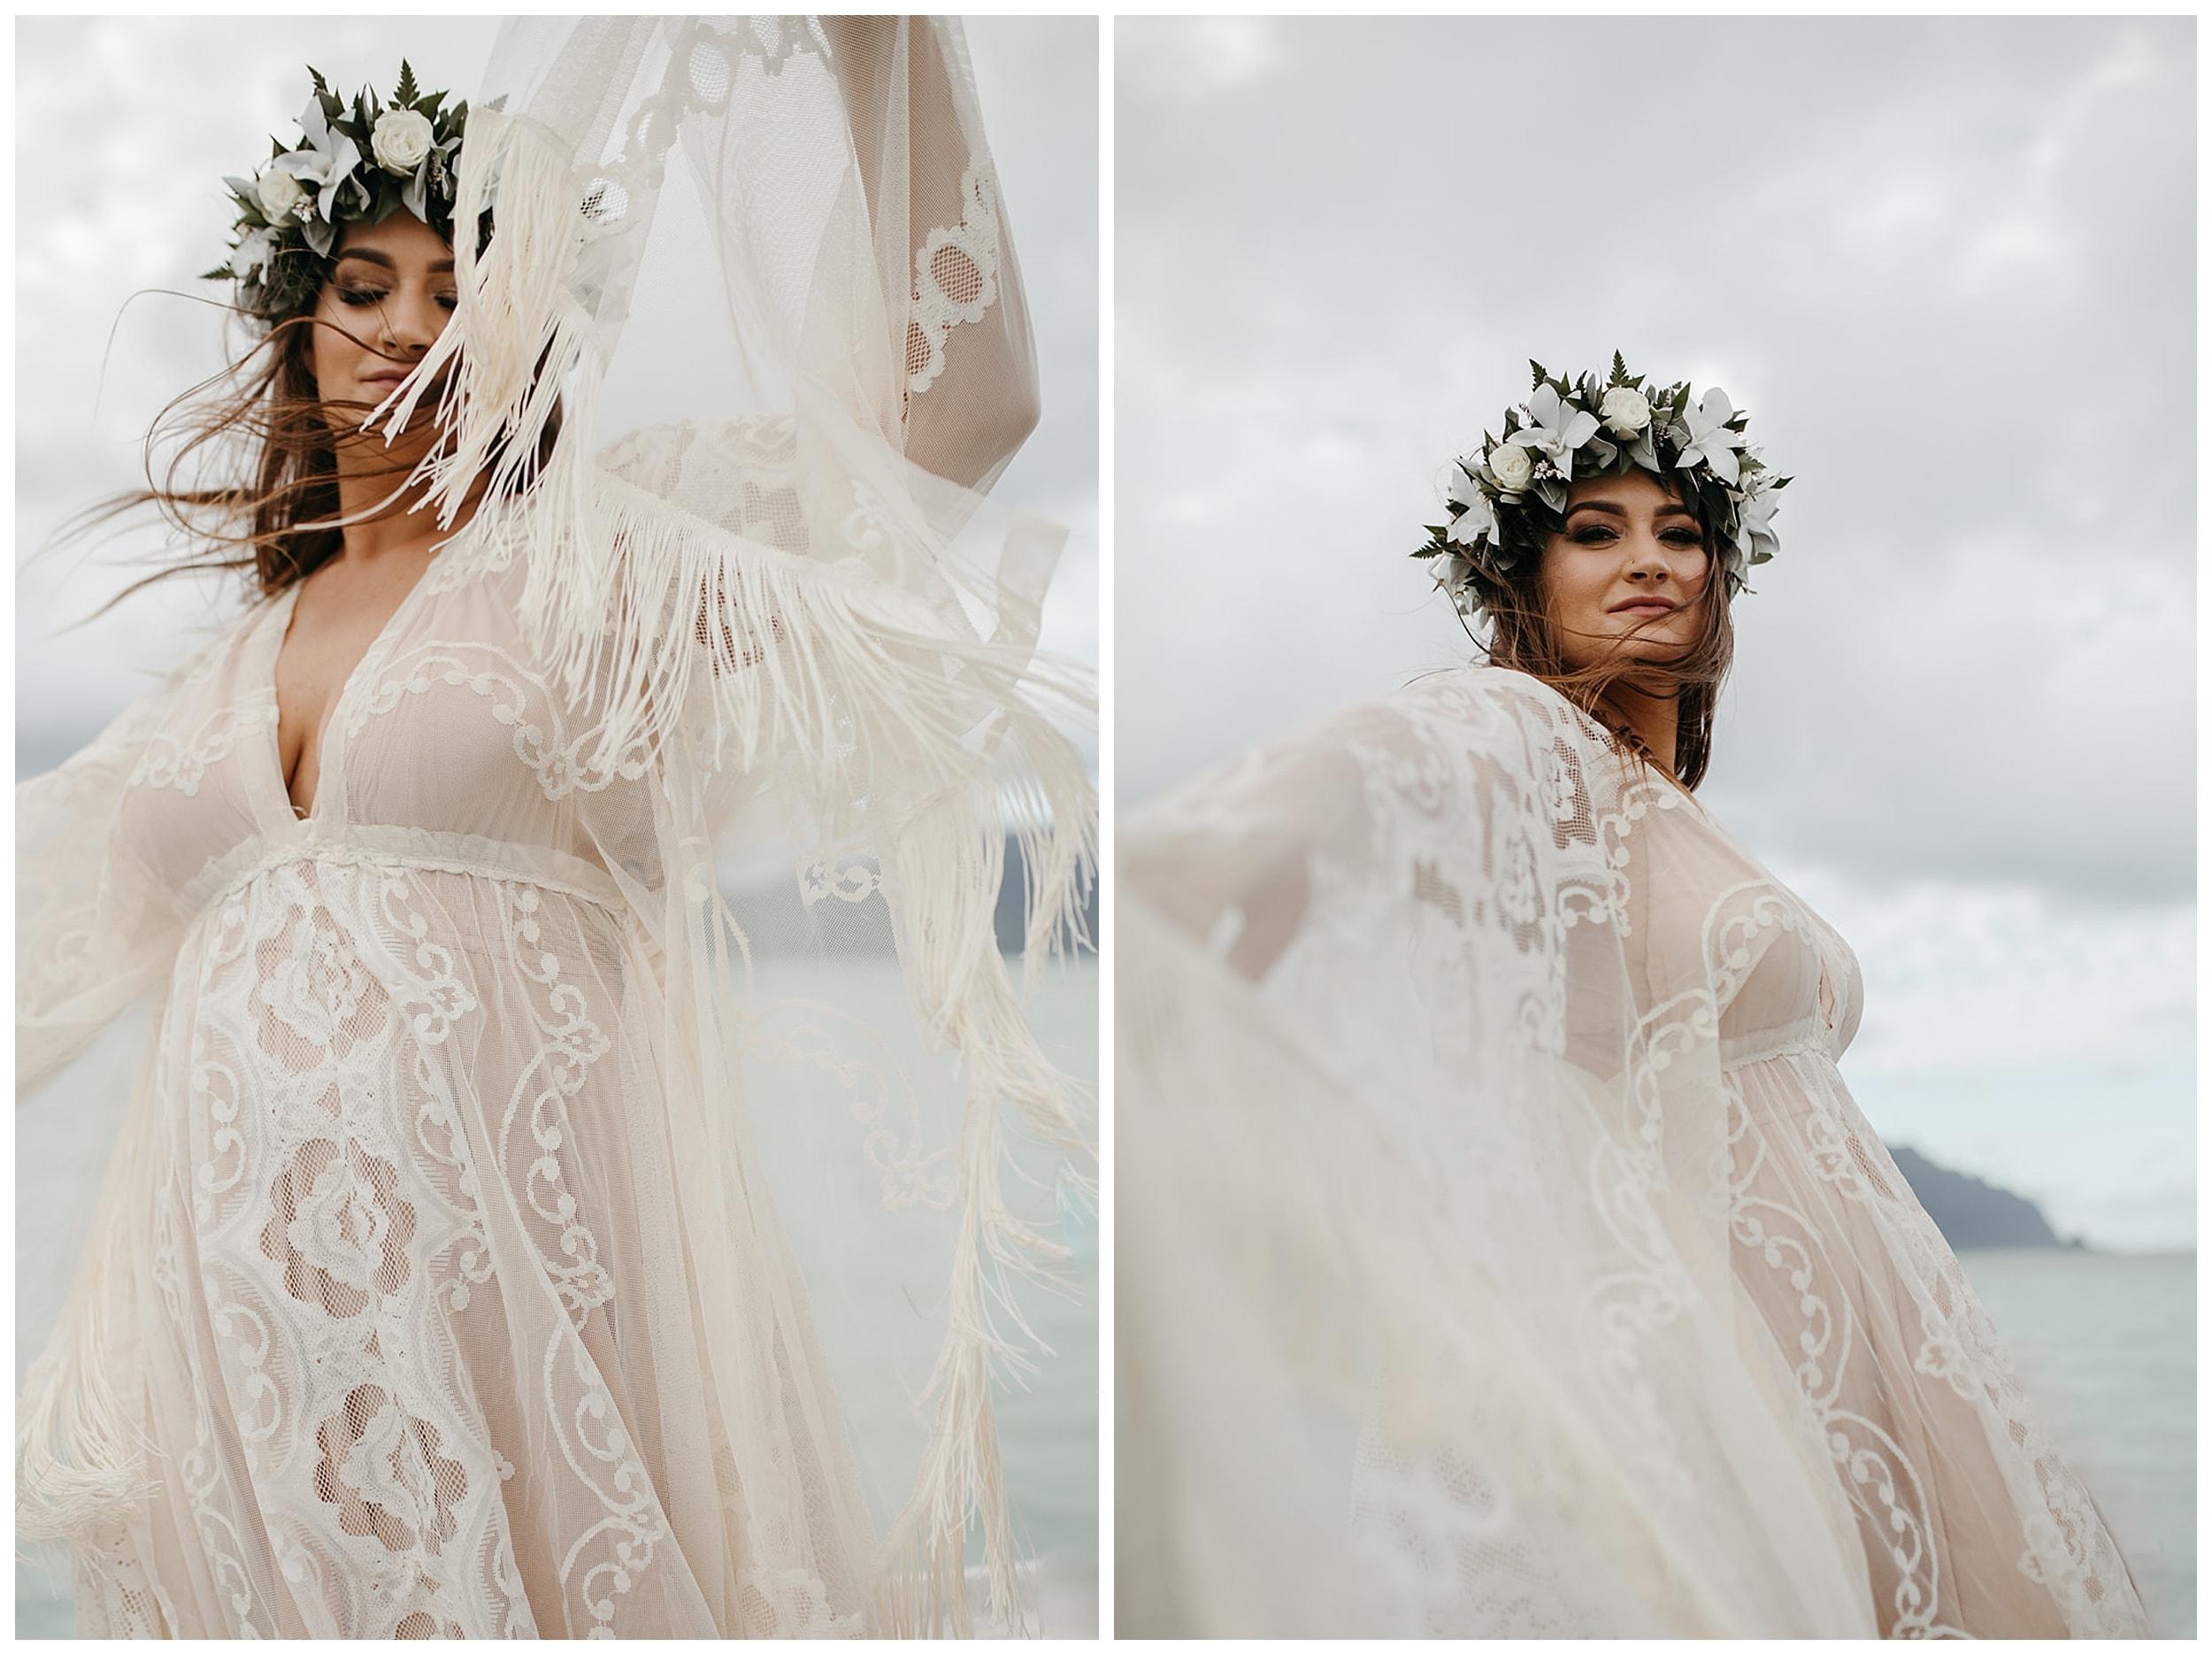 hawaii bride spinning in dress